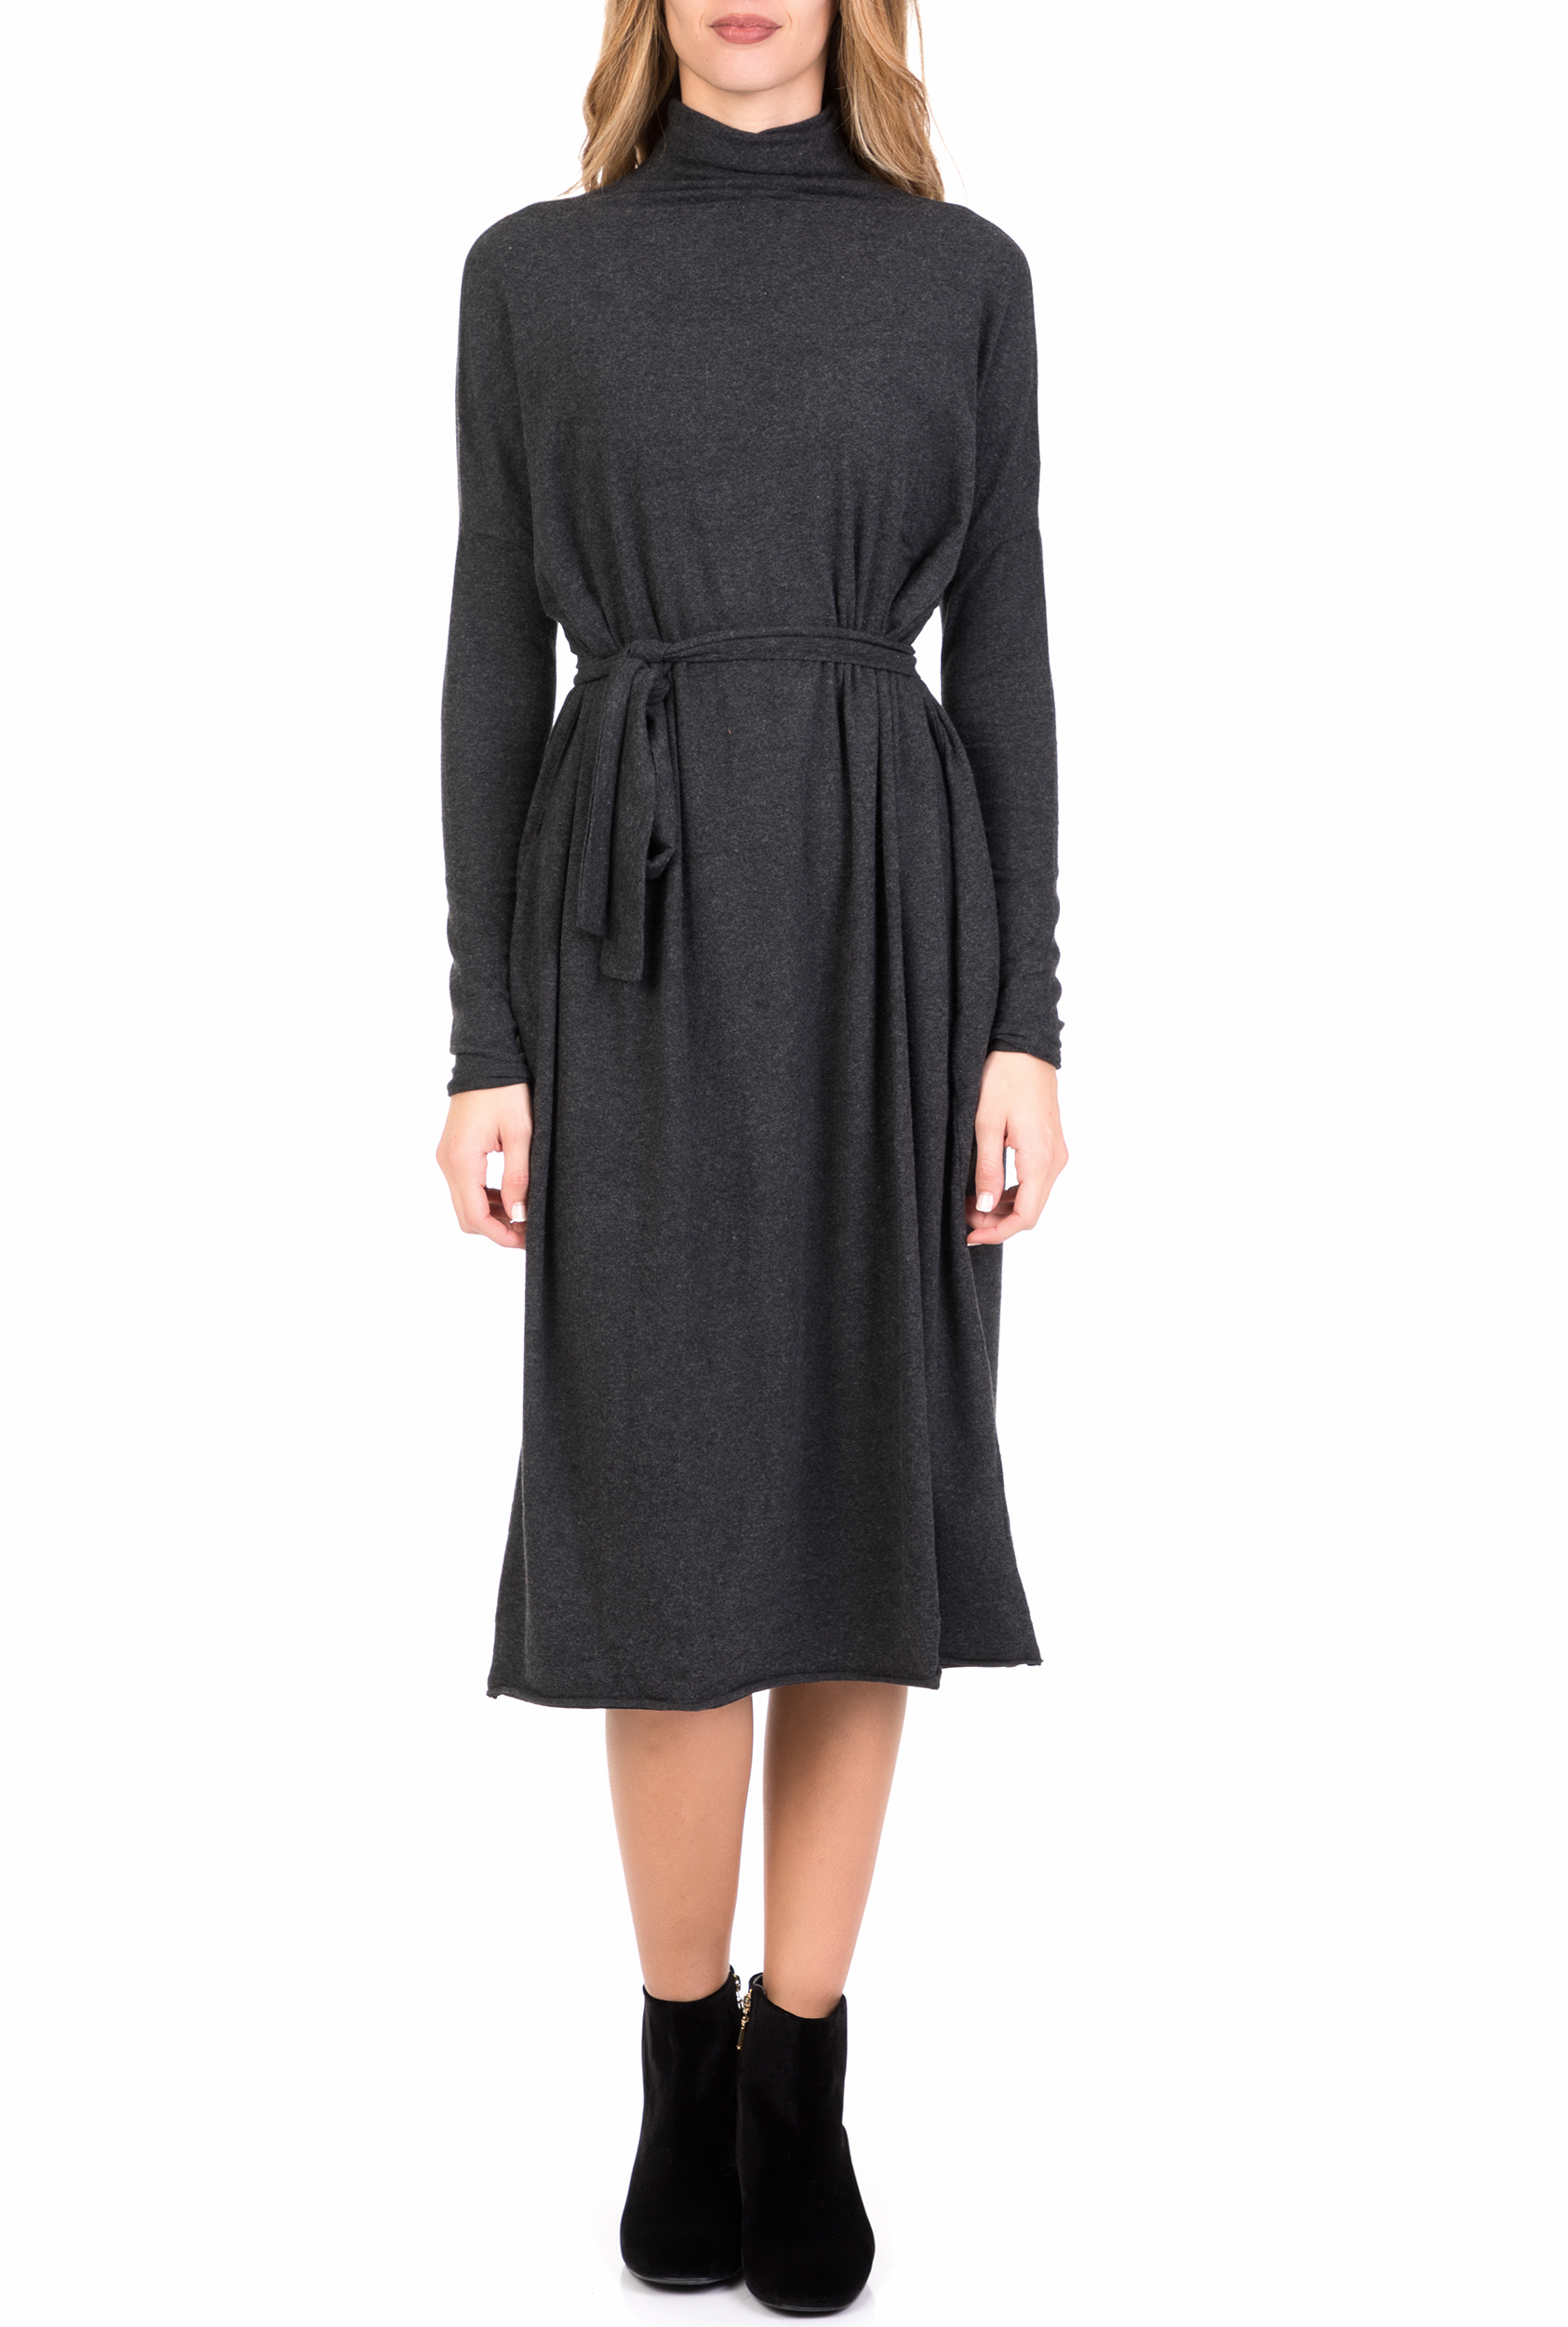 AMERICAN VINTAGE - Γυναικείο midi φόρεμα AMERICAN VINTAGE γκρι